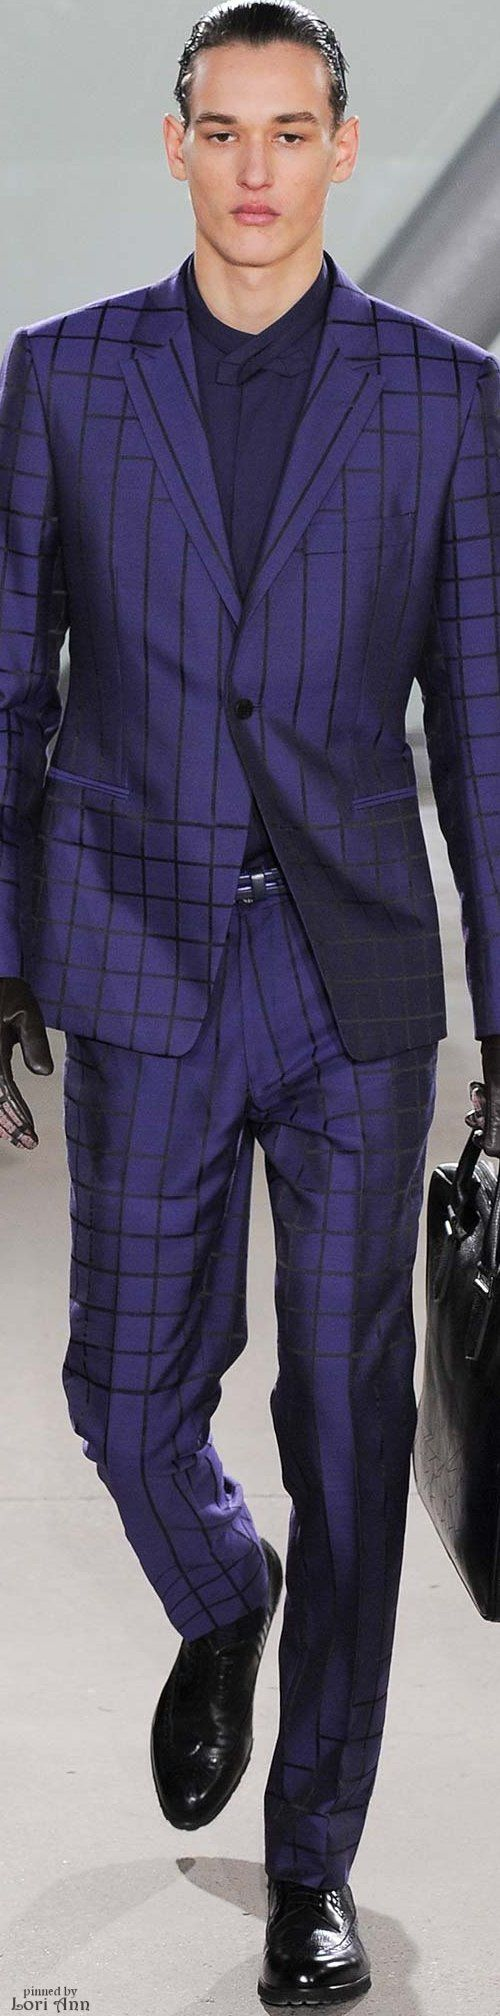 Issey Miyake Fall 2015 Menswear